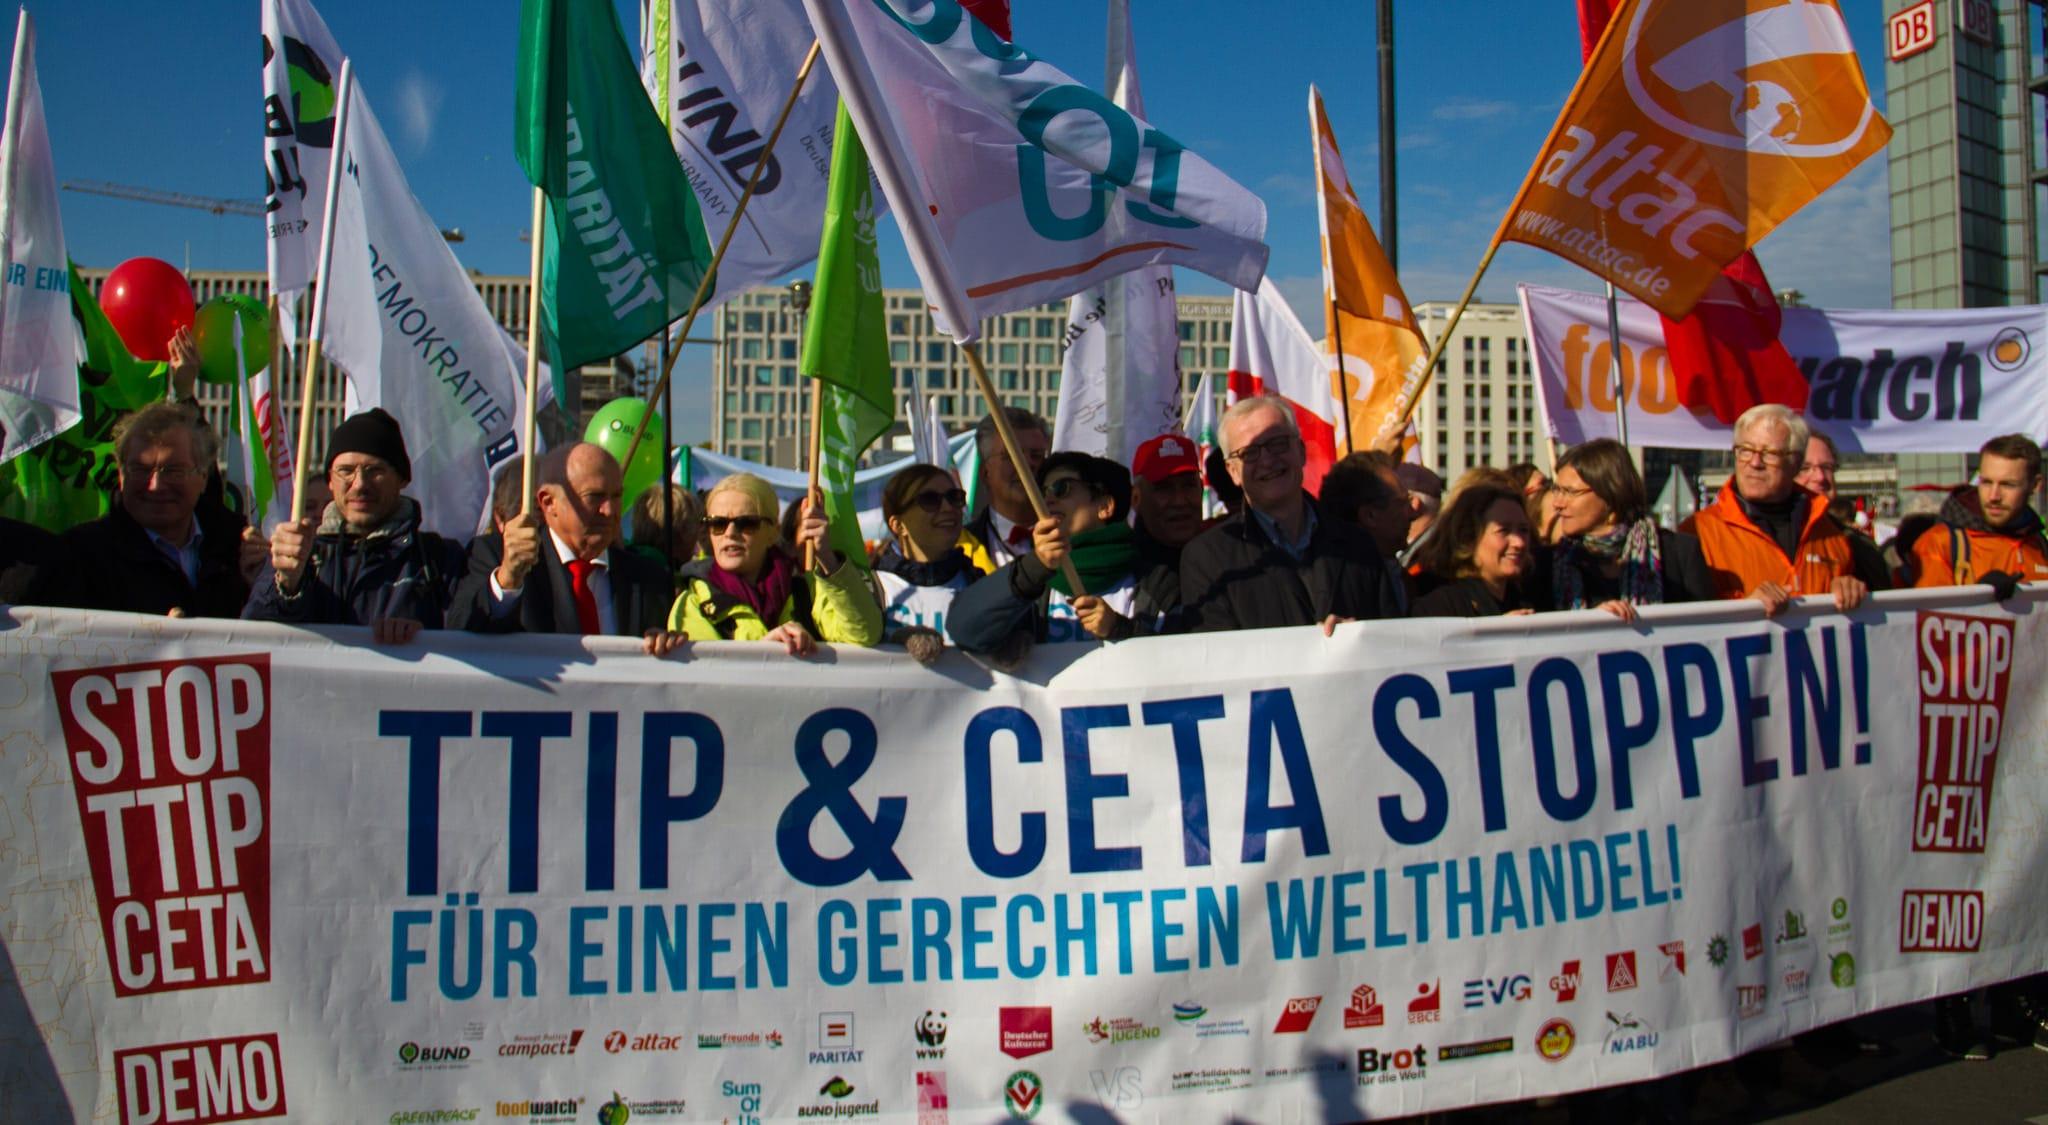 TTIP, TTIP, kein Hurra!